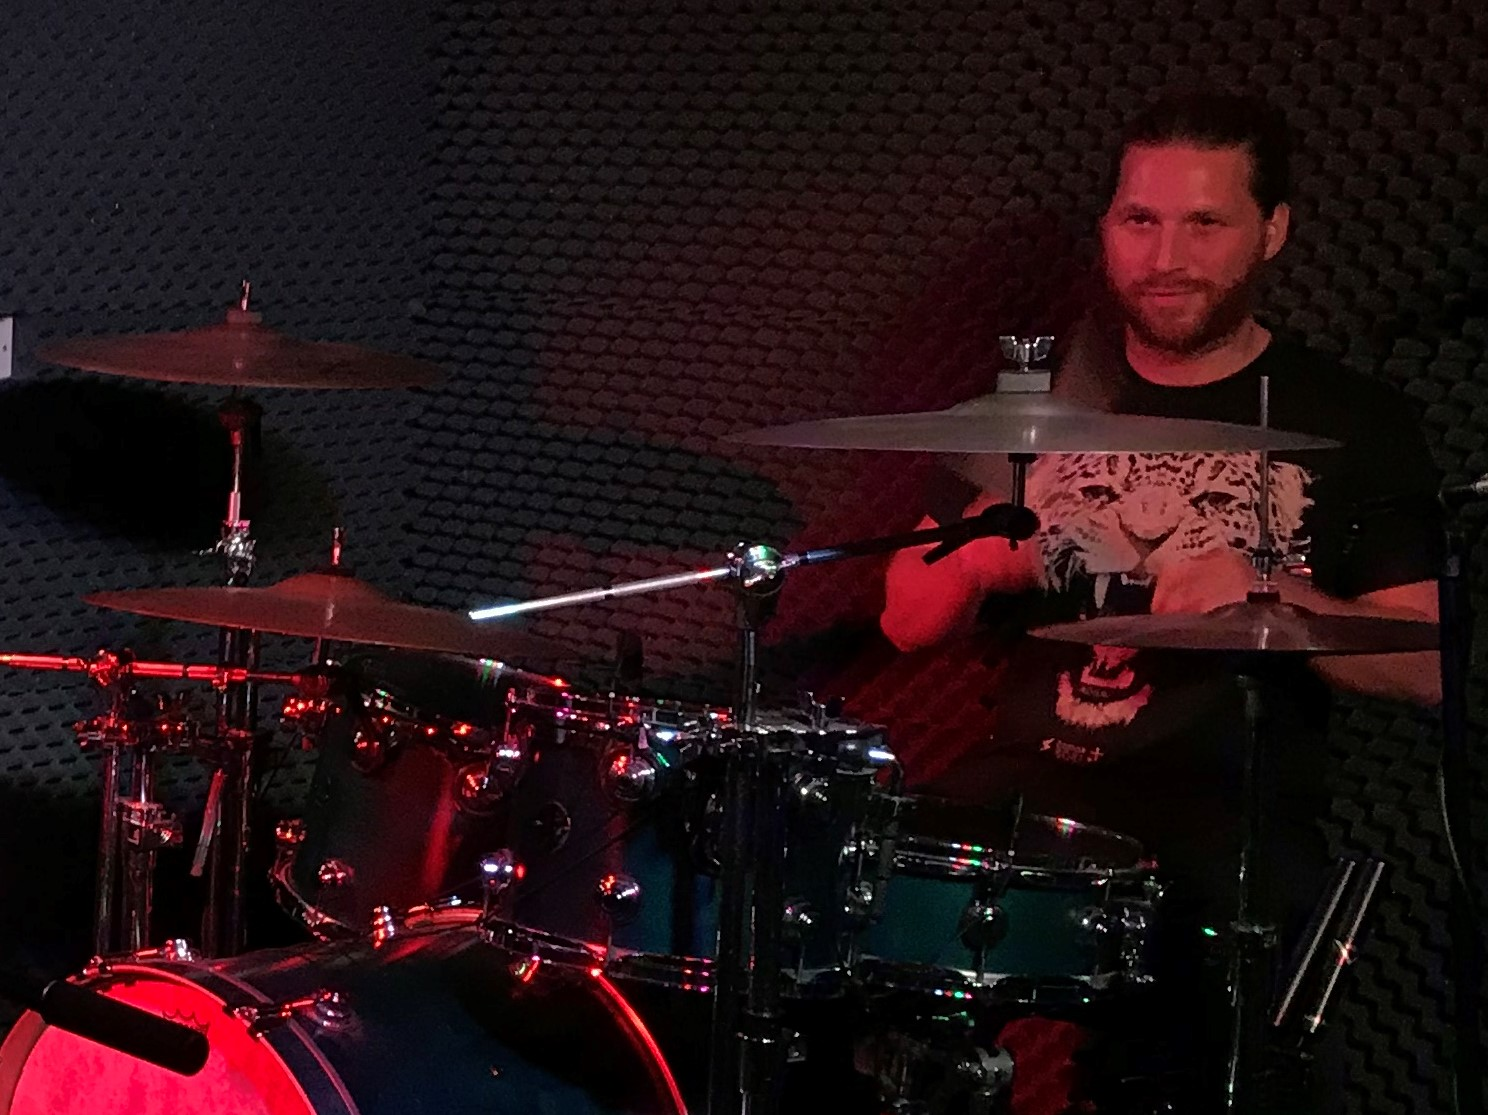 Steve Tanton, Professional Drummer